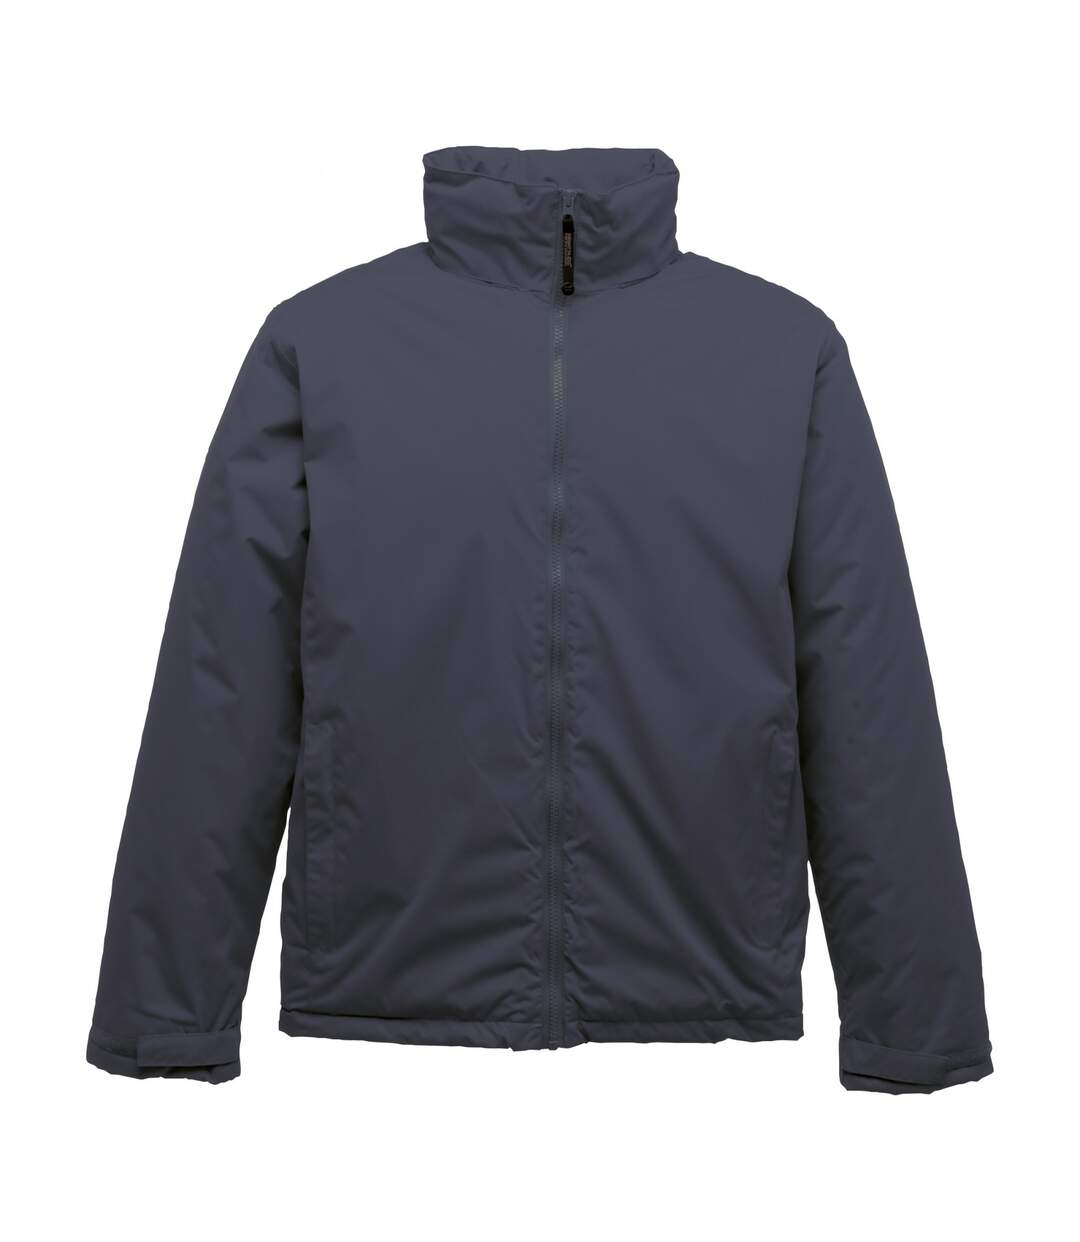 Regatta Professional Mens Classic Shell Waterproof Jacket (Navy) - UTRG1915